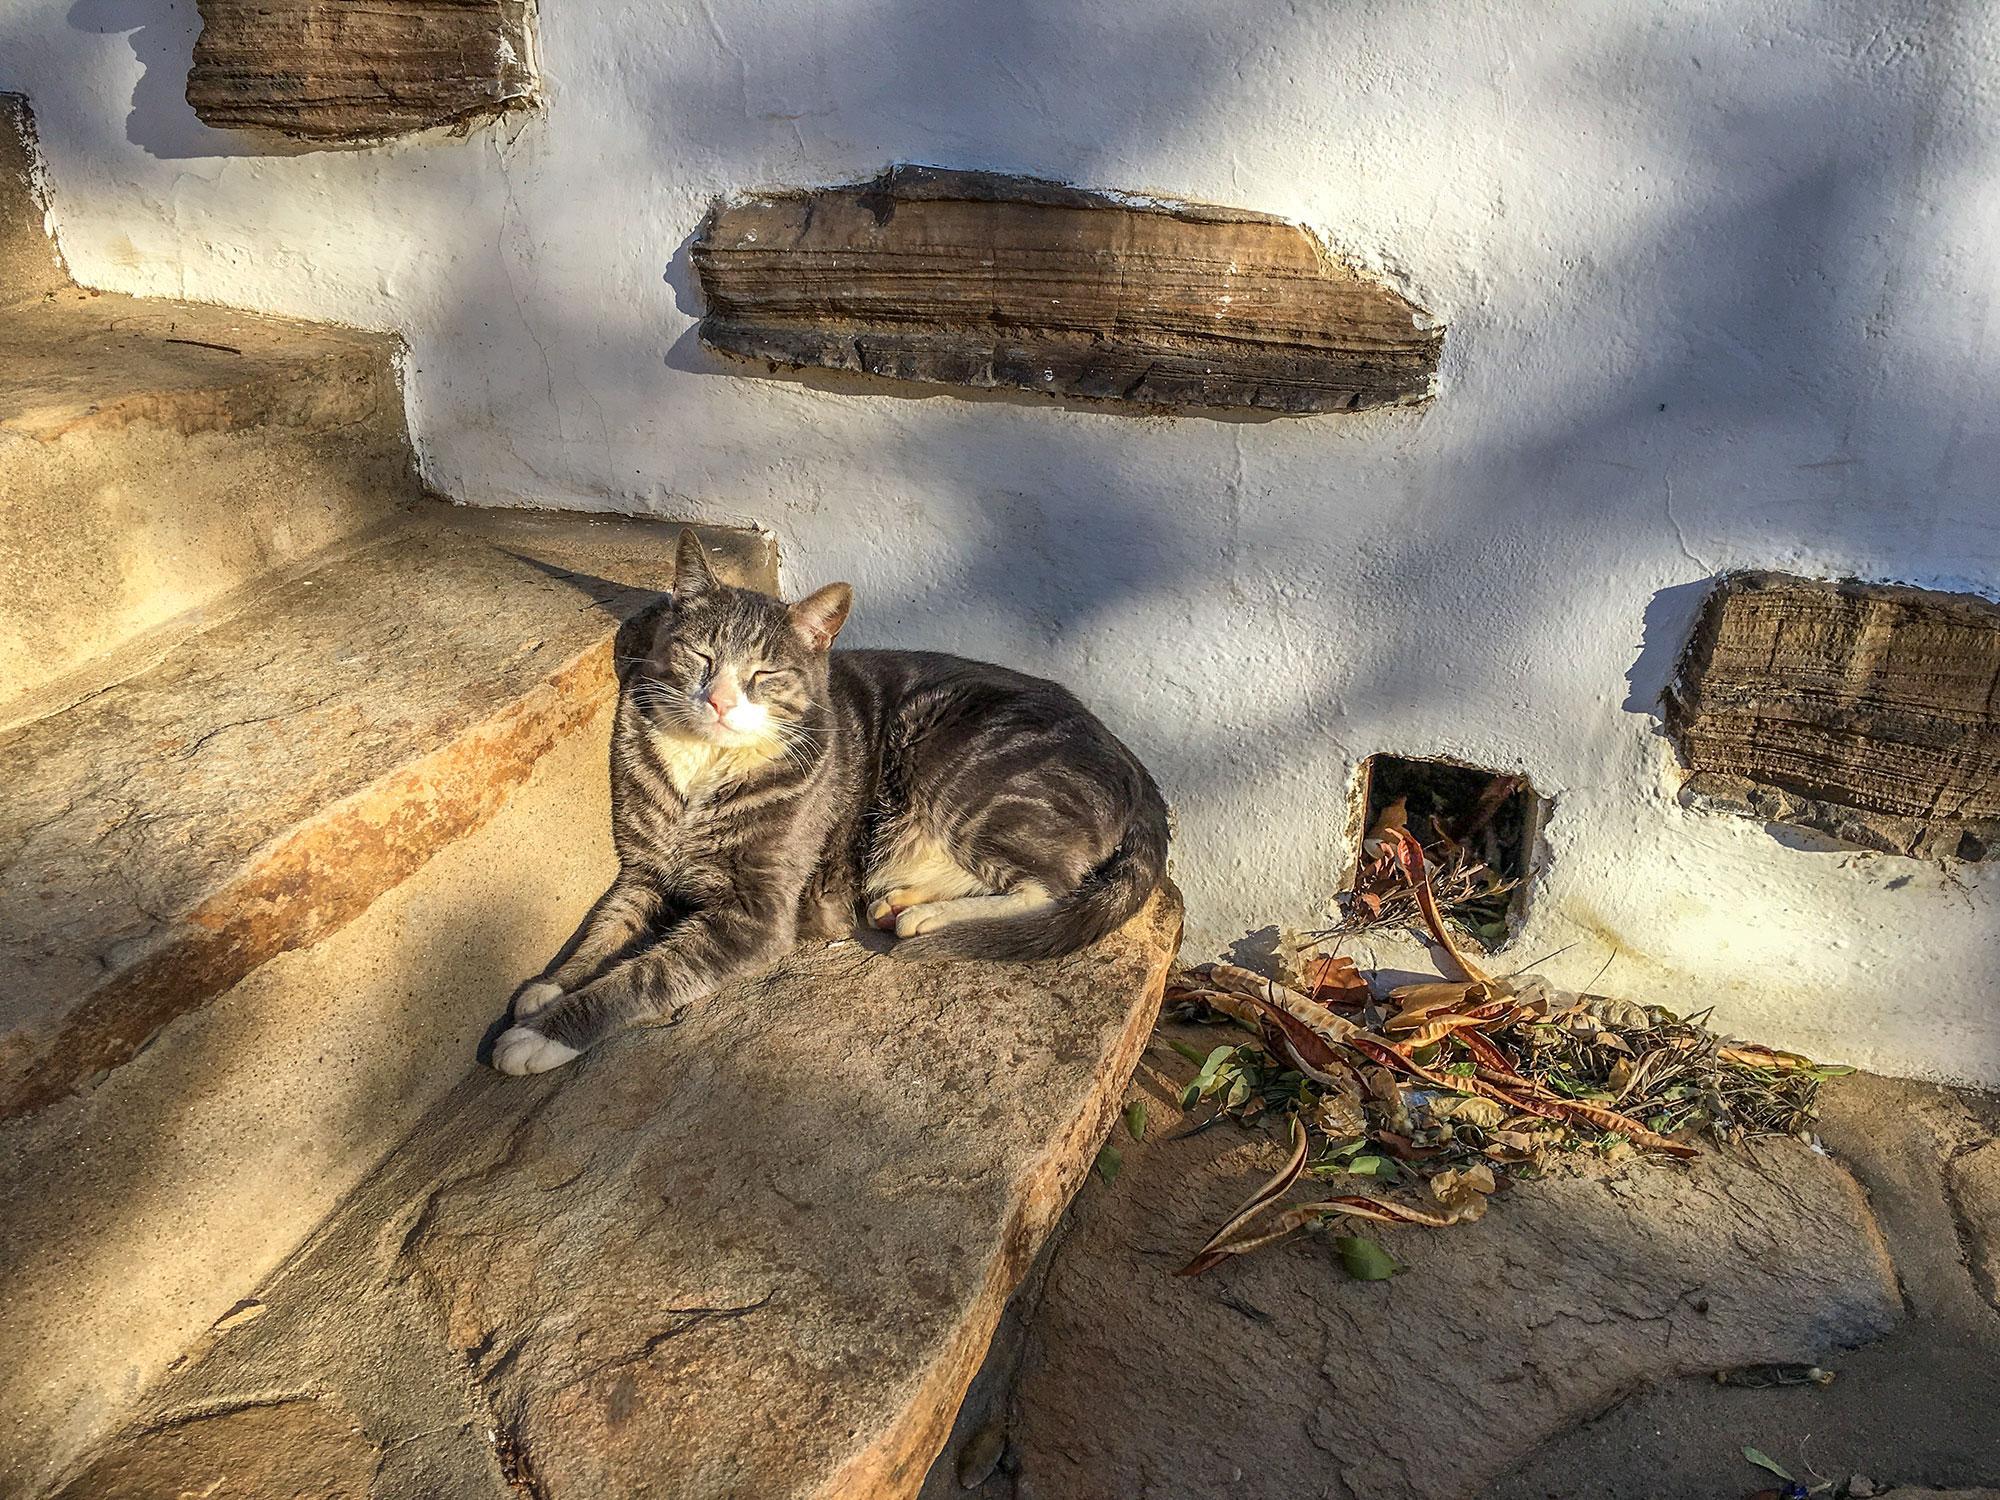 Cat at Trans-Kalahari Inn, Windhoek, Namibia, Africa